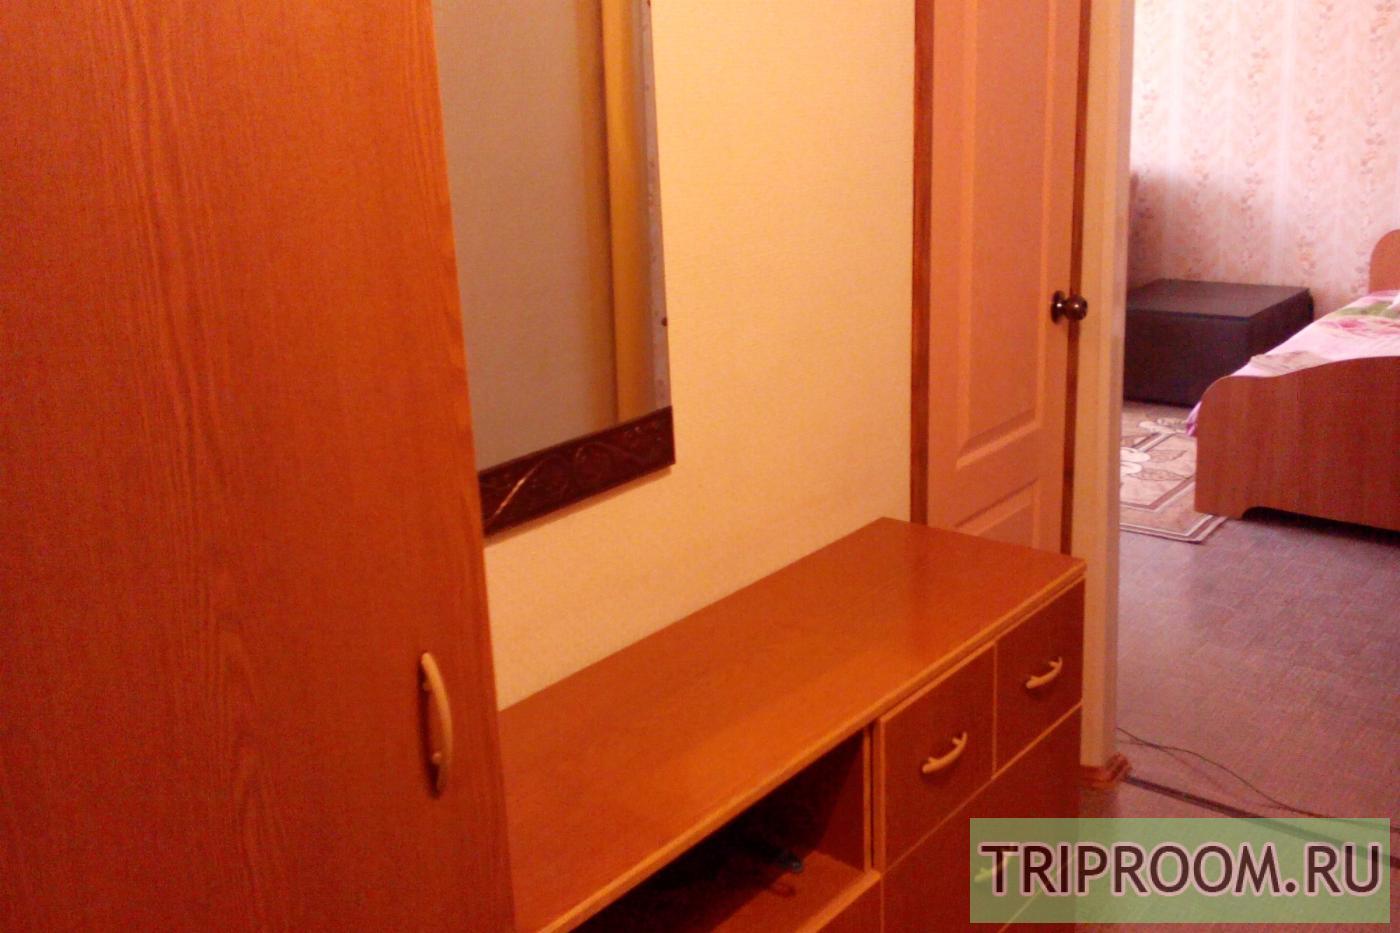 1-комнатная квартира посуточно (вариант № 11198), ул. Сони Кривой улица, фото № 15